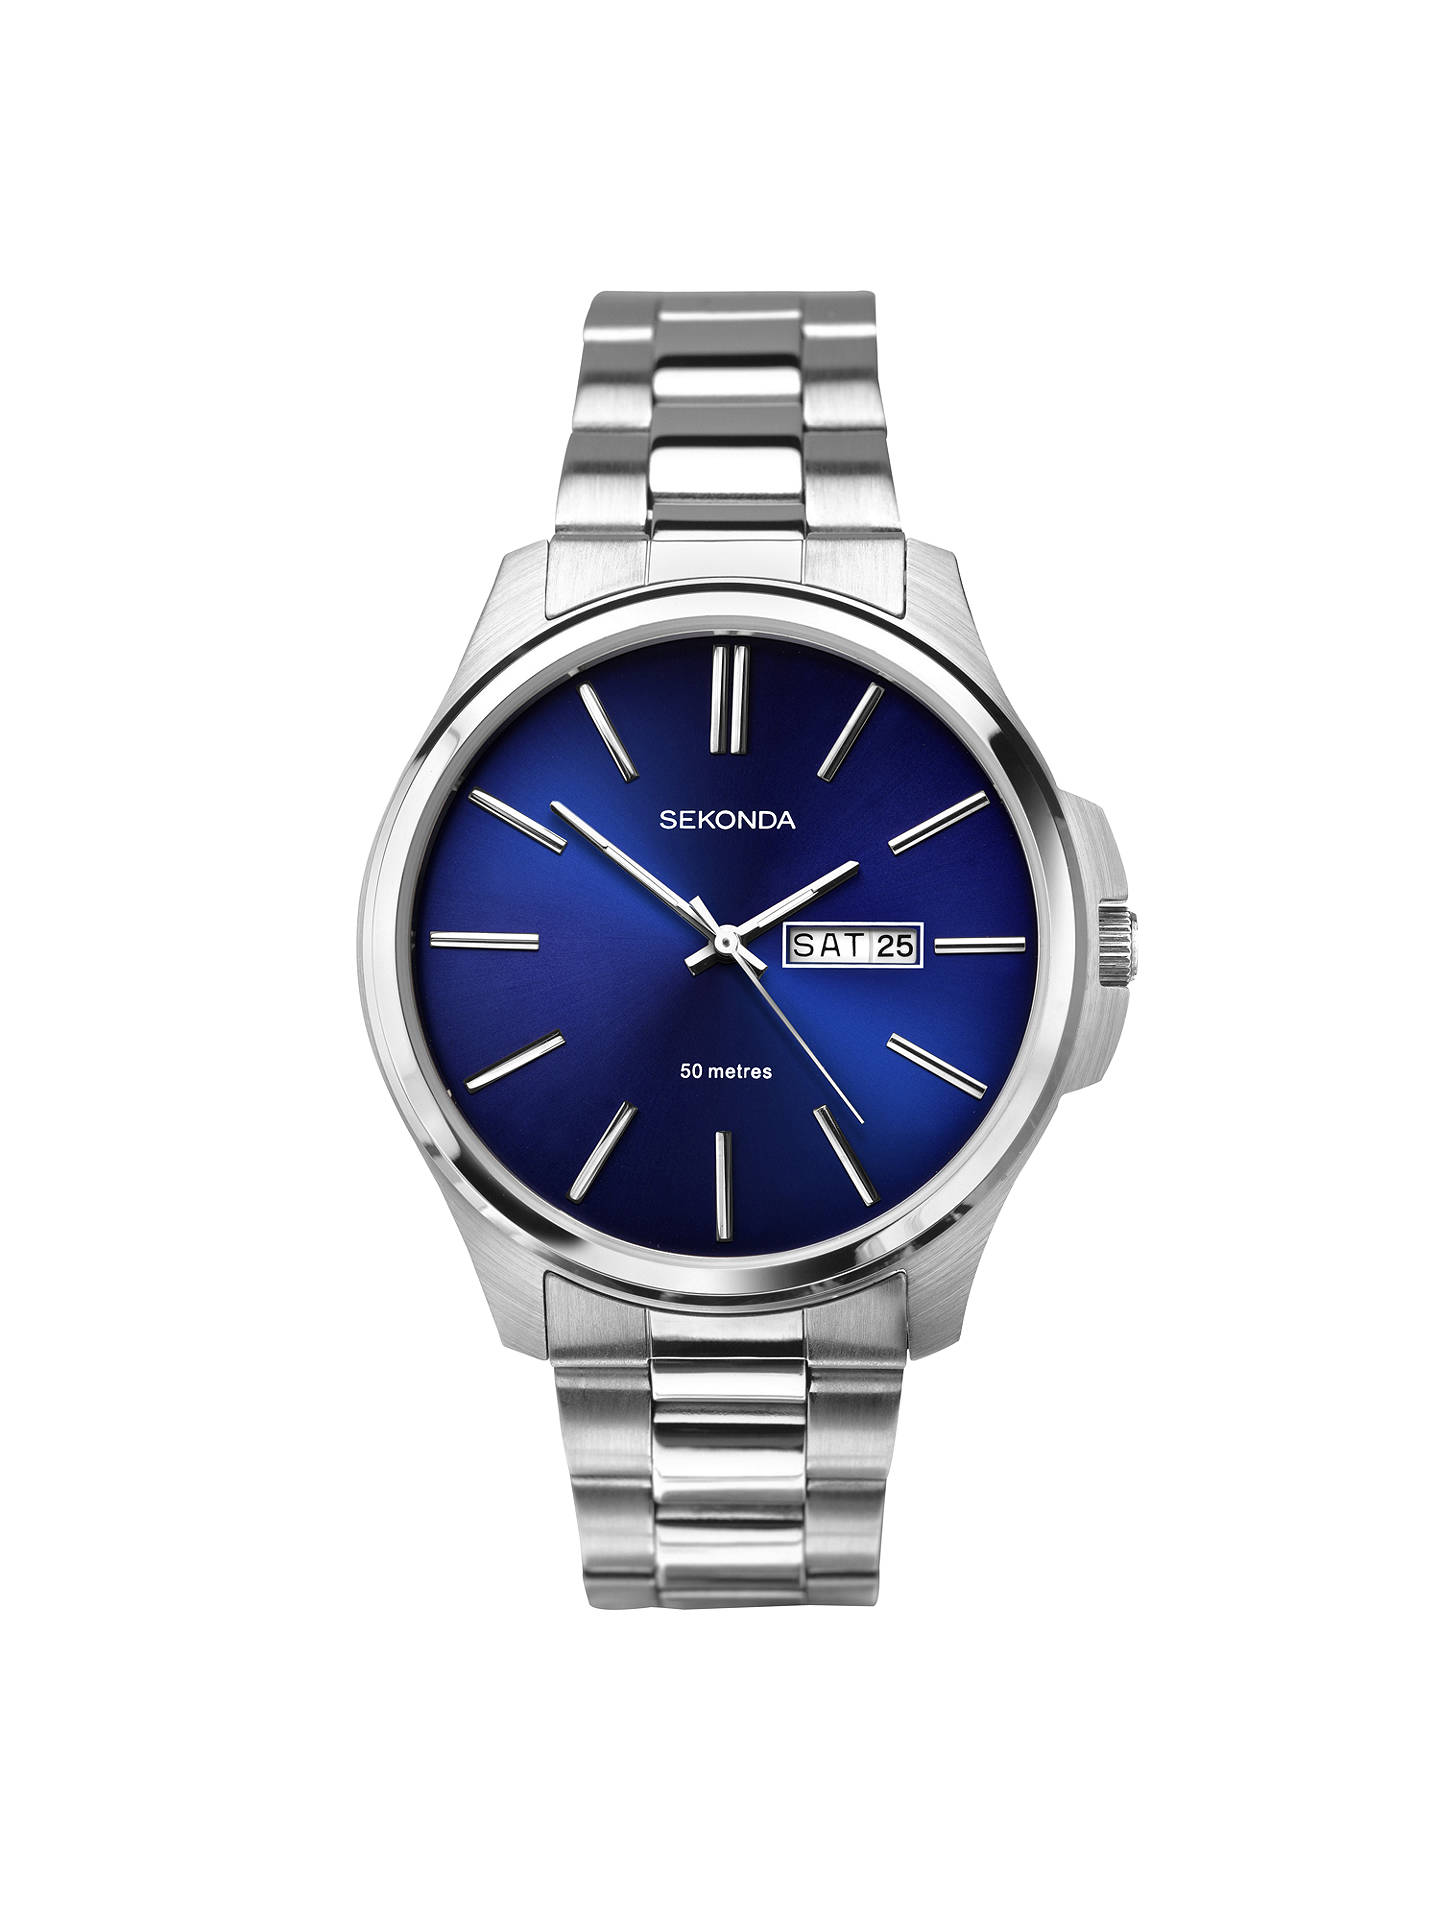 8c402e58e1e7 Sekonda Men s Day Date Bracelet Strap Watch at John Lewis   Partners